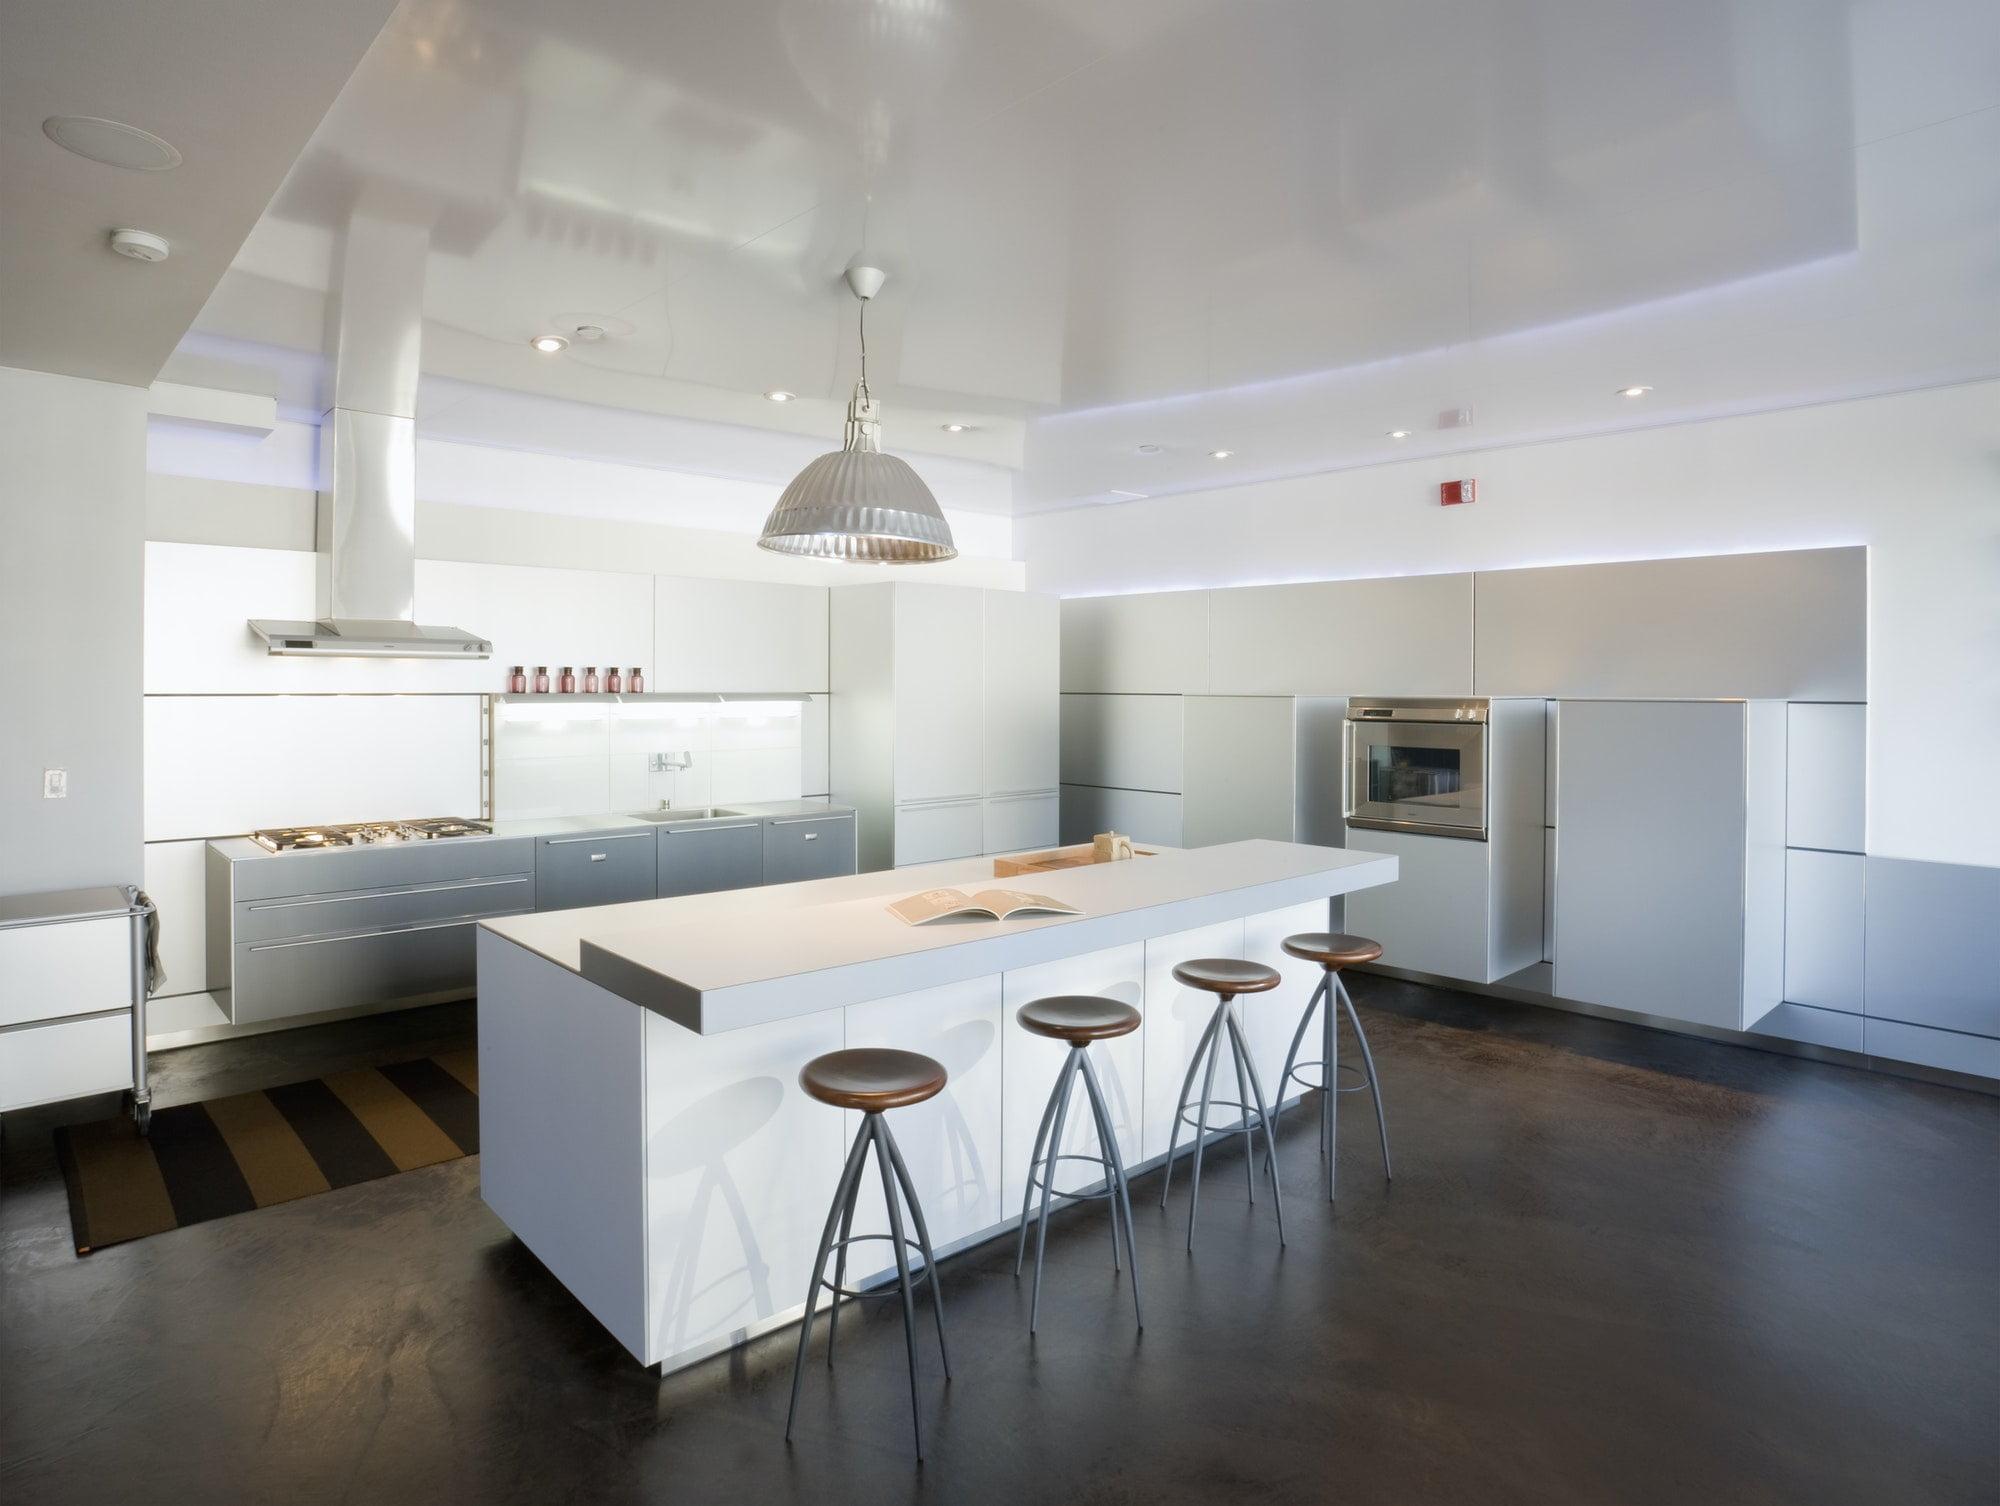 Reformas Cocinas Las Palmas Modern kitchen